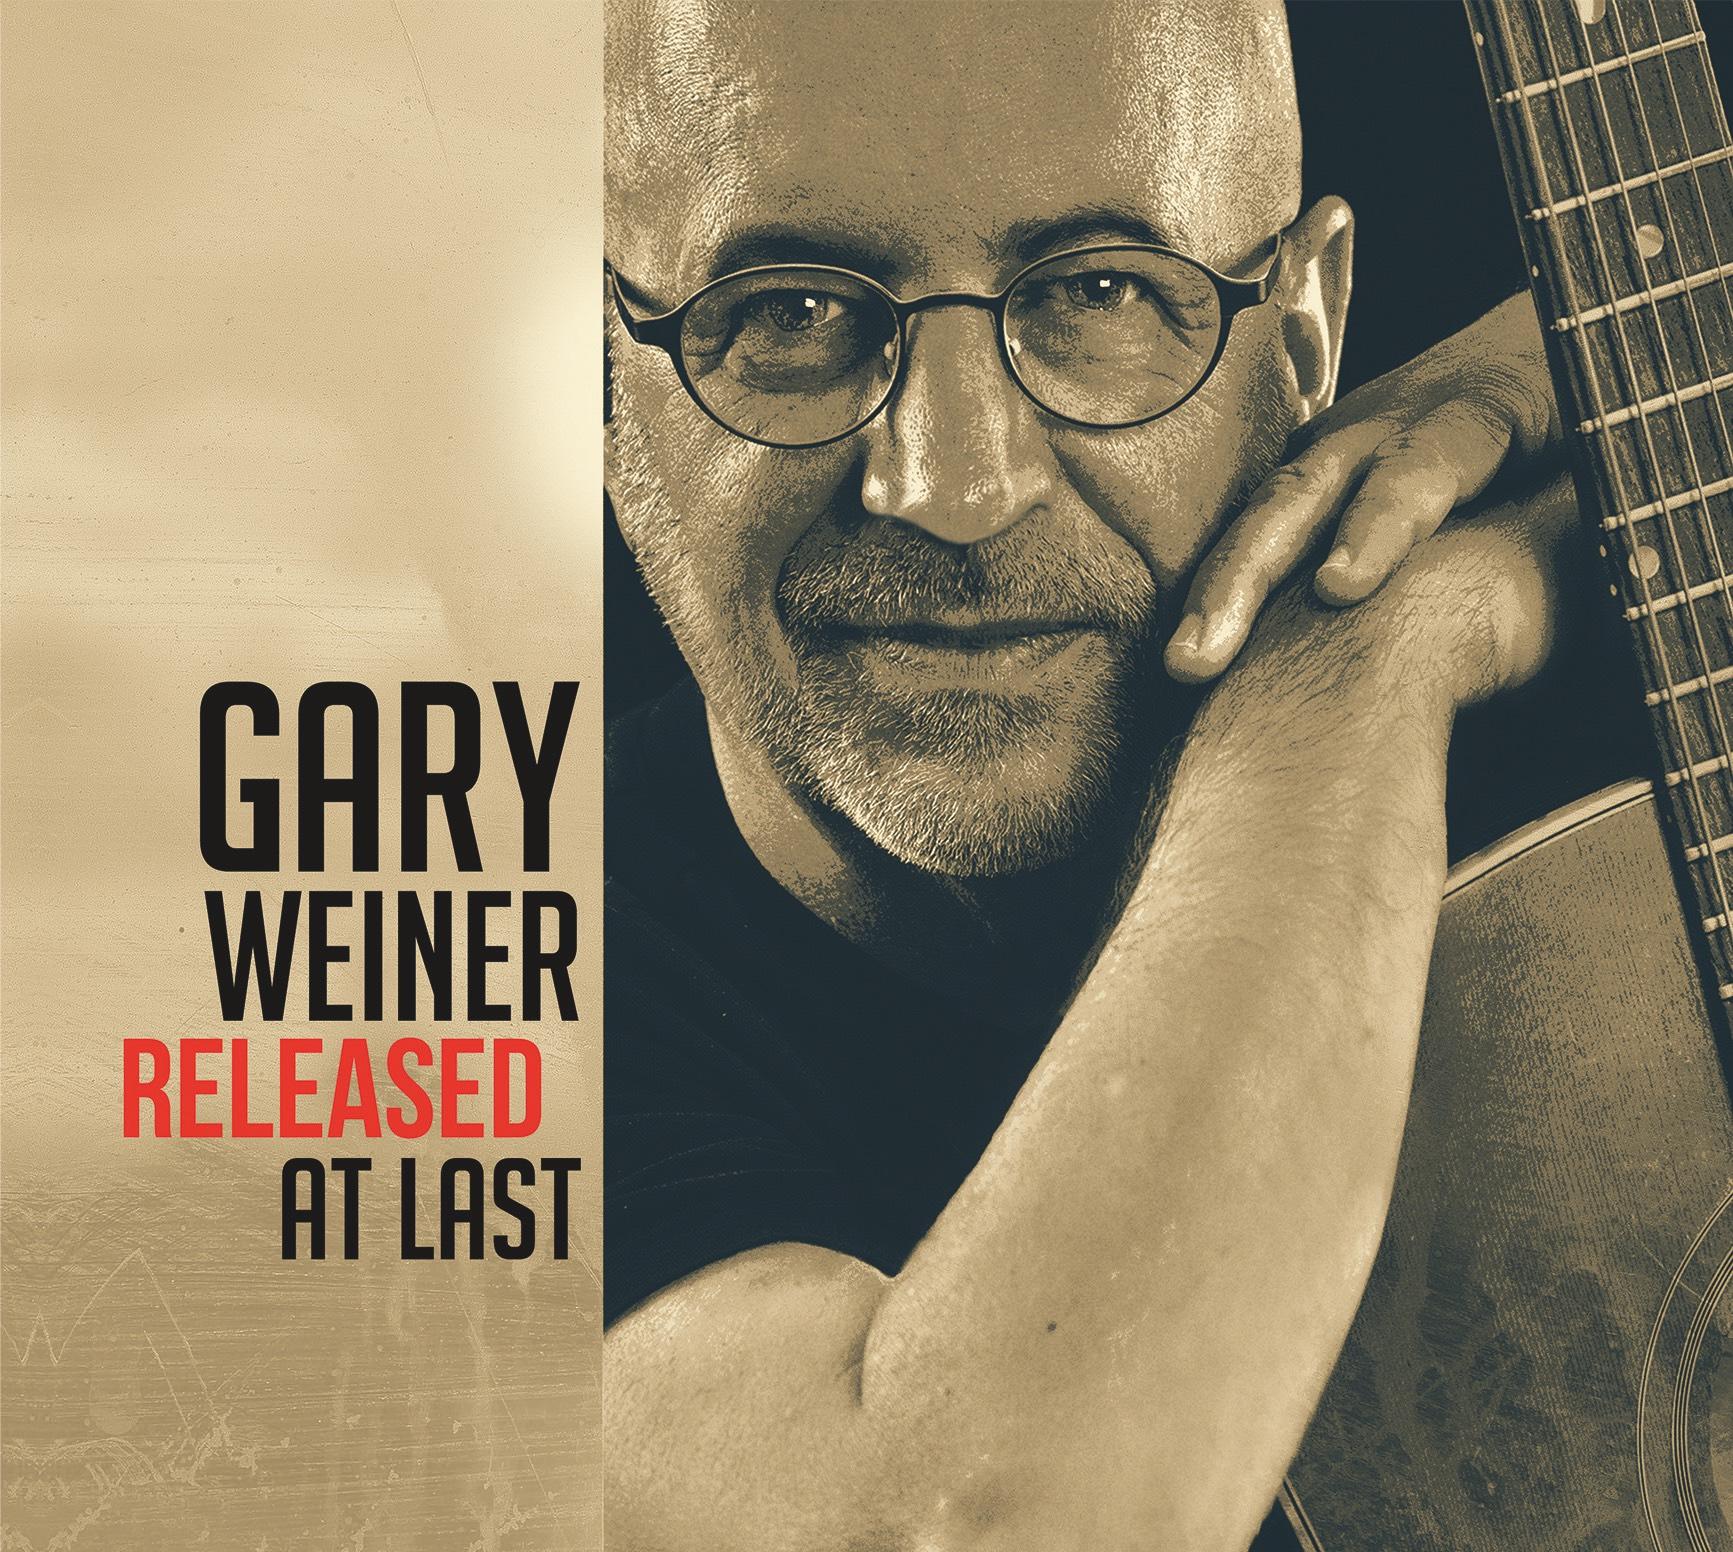 Gary-Weiner-Released-At-Last.jpg